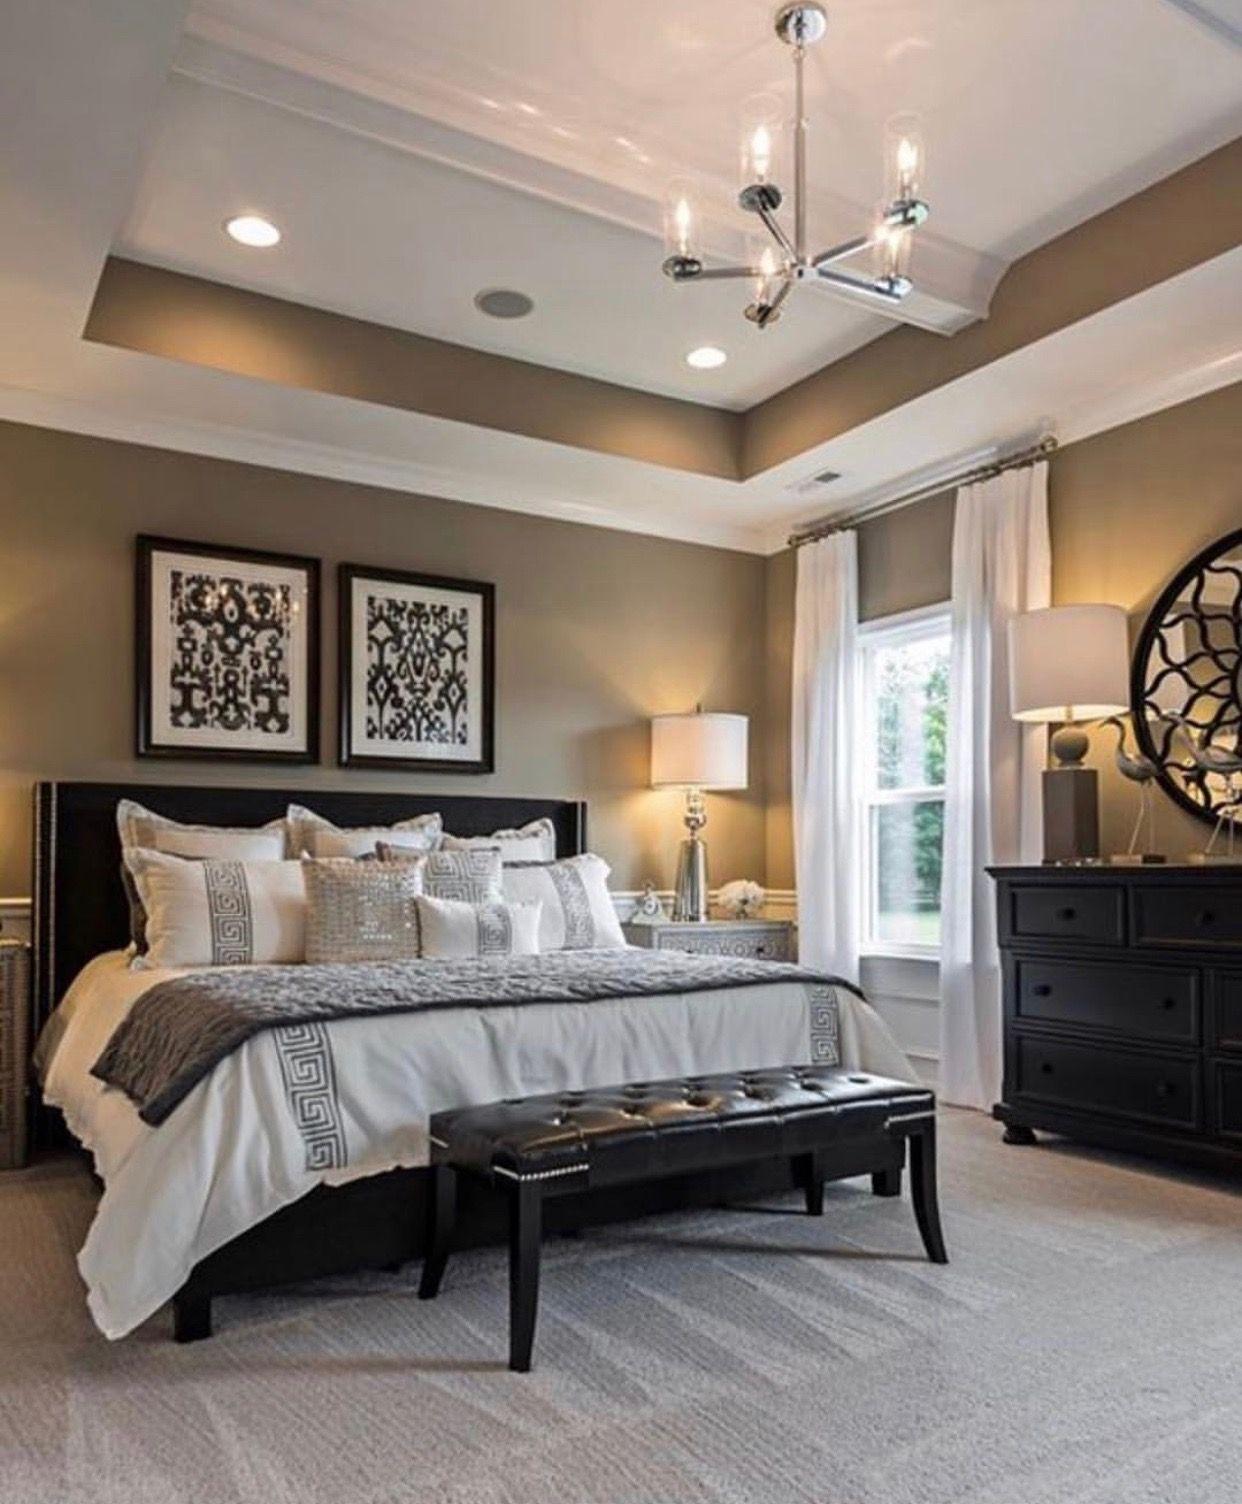 Pin by Karin Miranda on Deco  Master bedroom remodel, Master